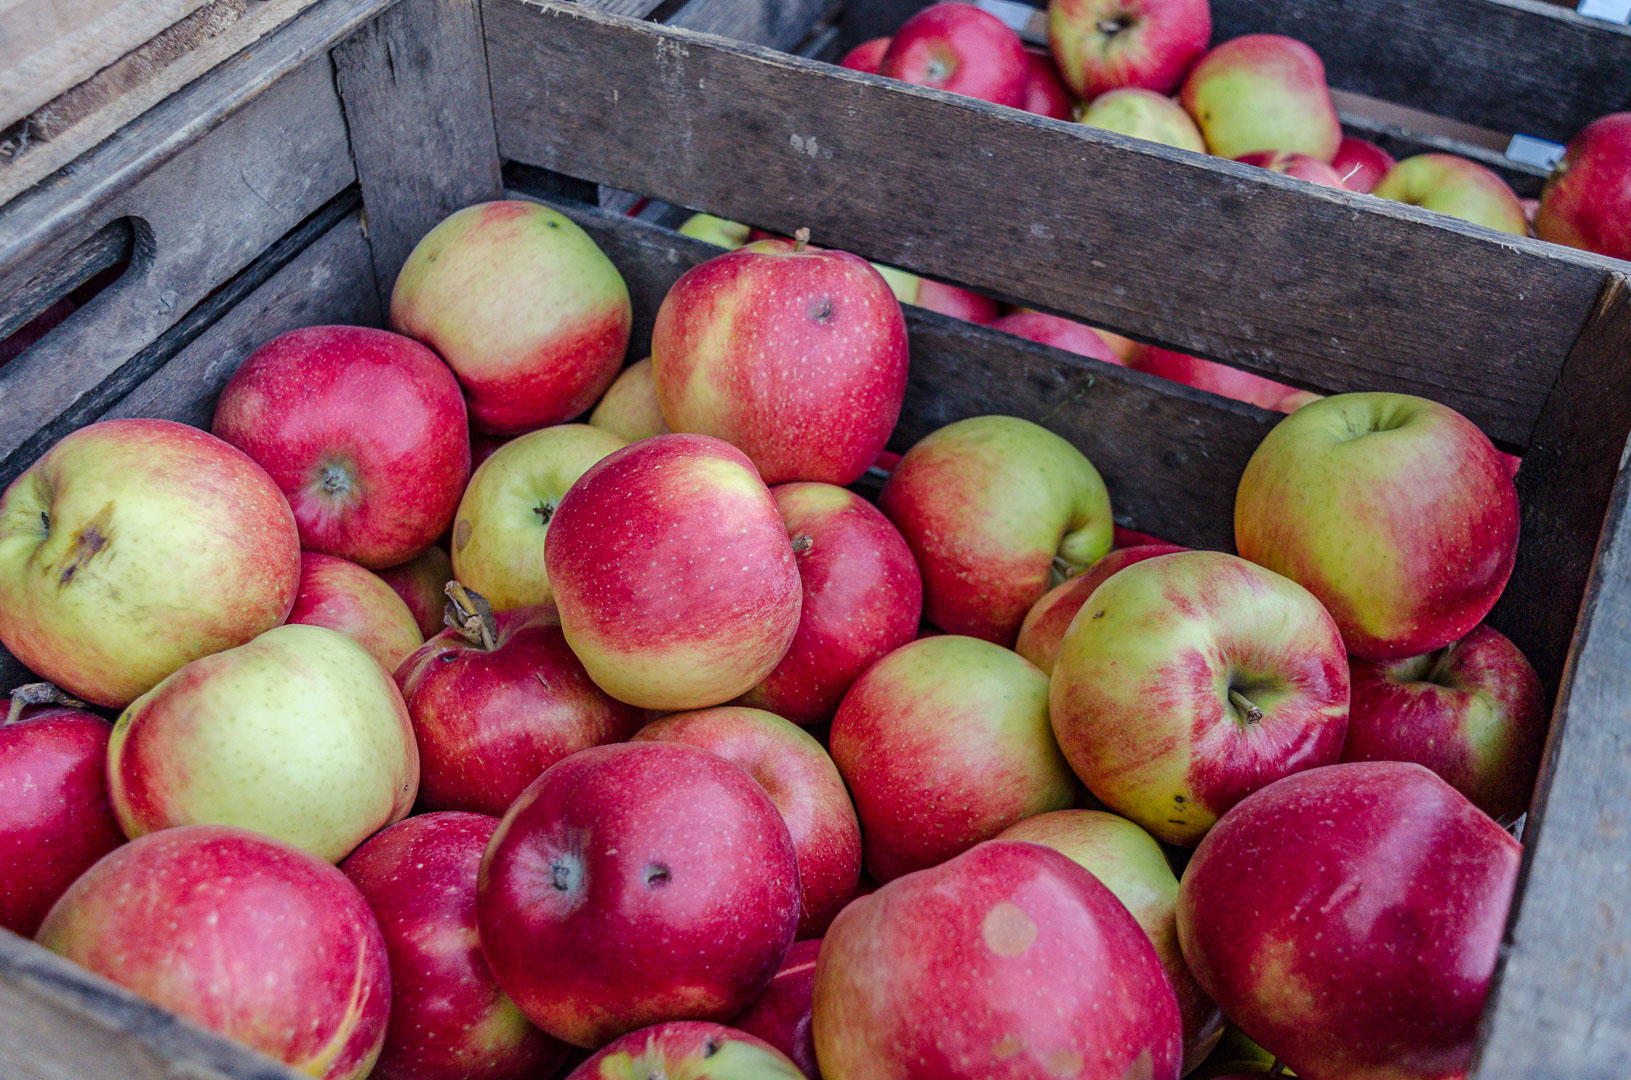 Apfelkiste-Altes-Land